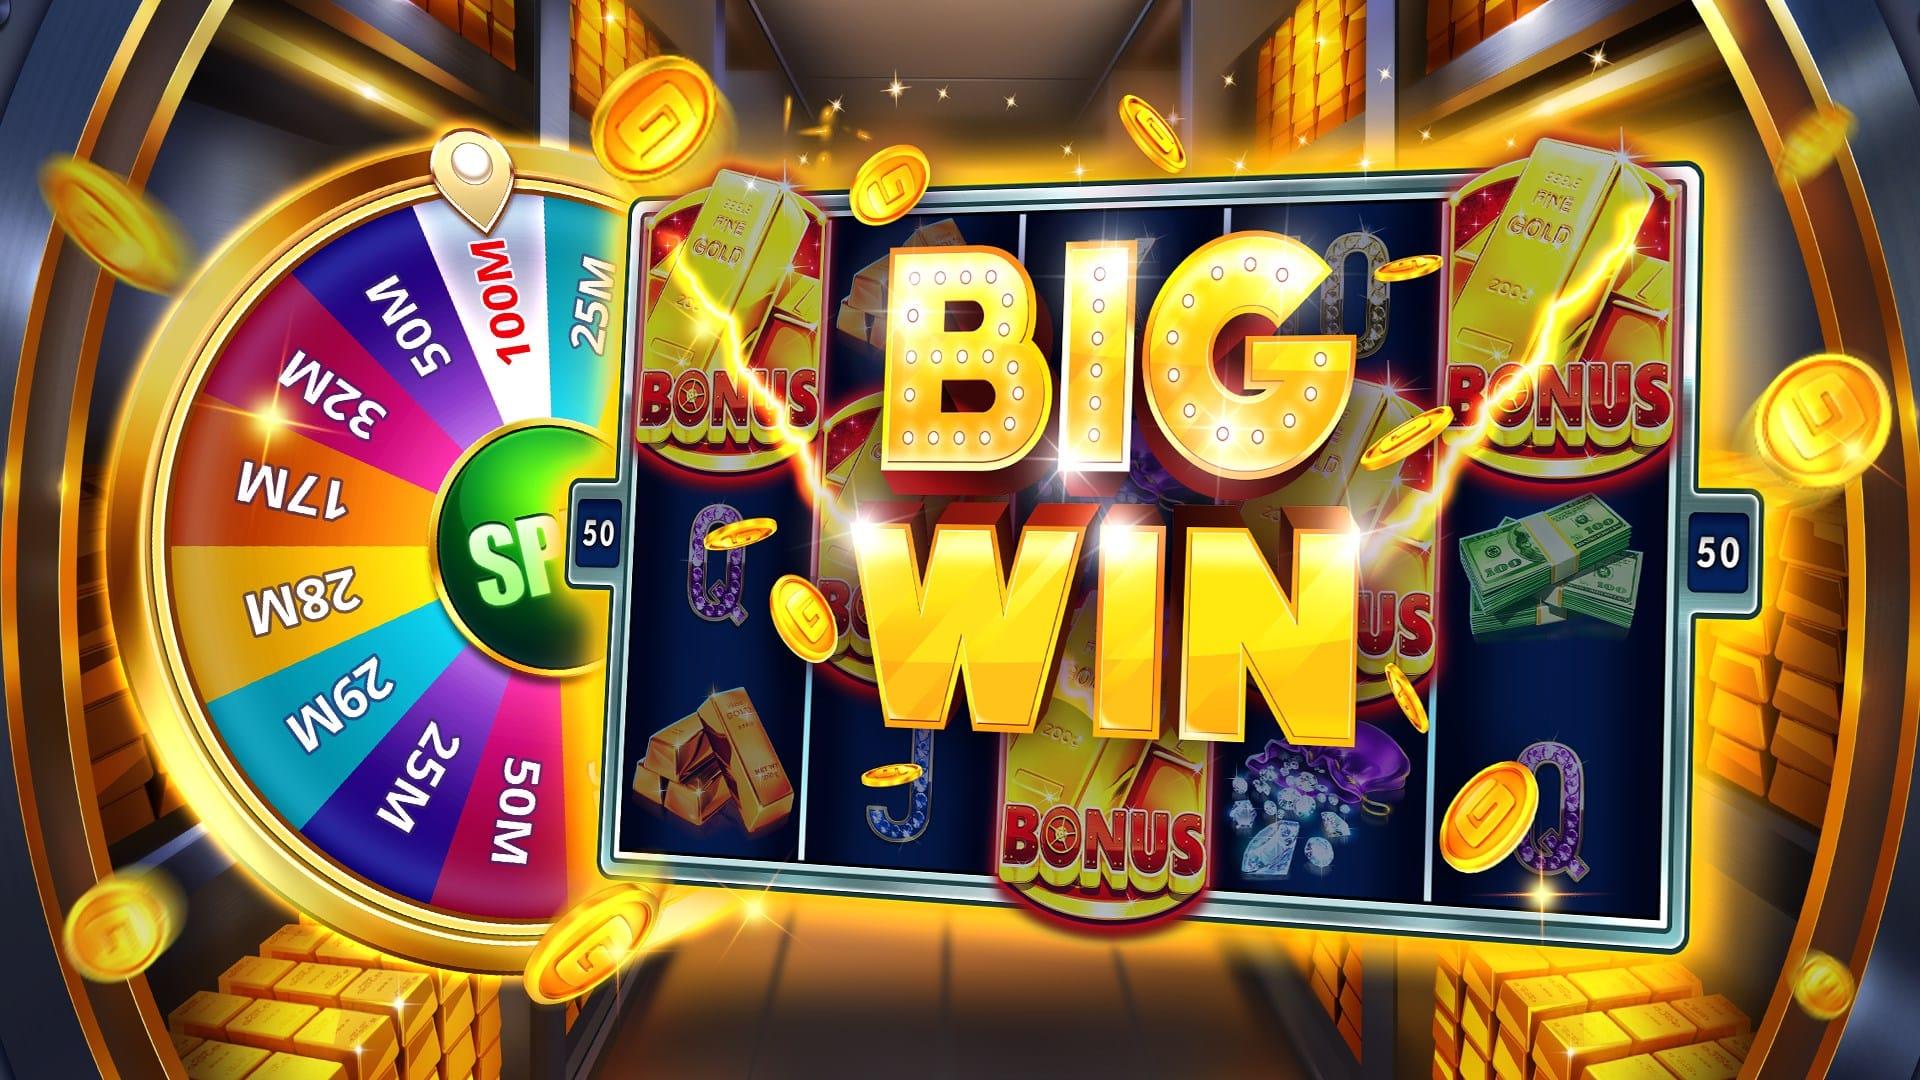 Online casino gaming explained